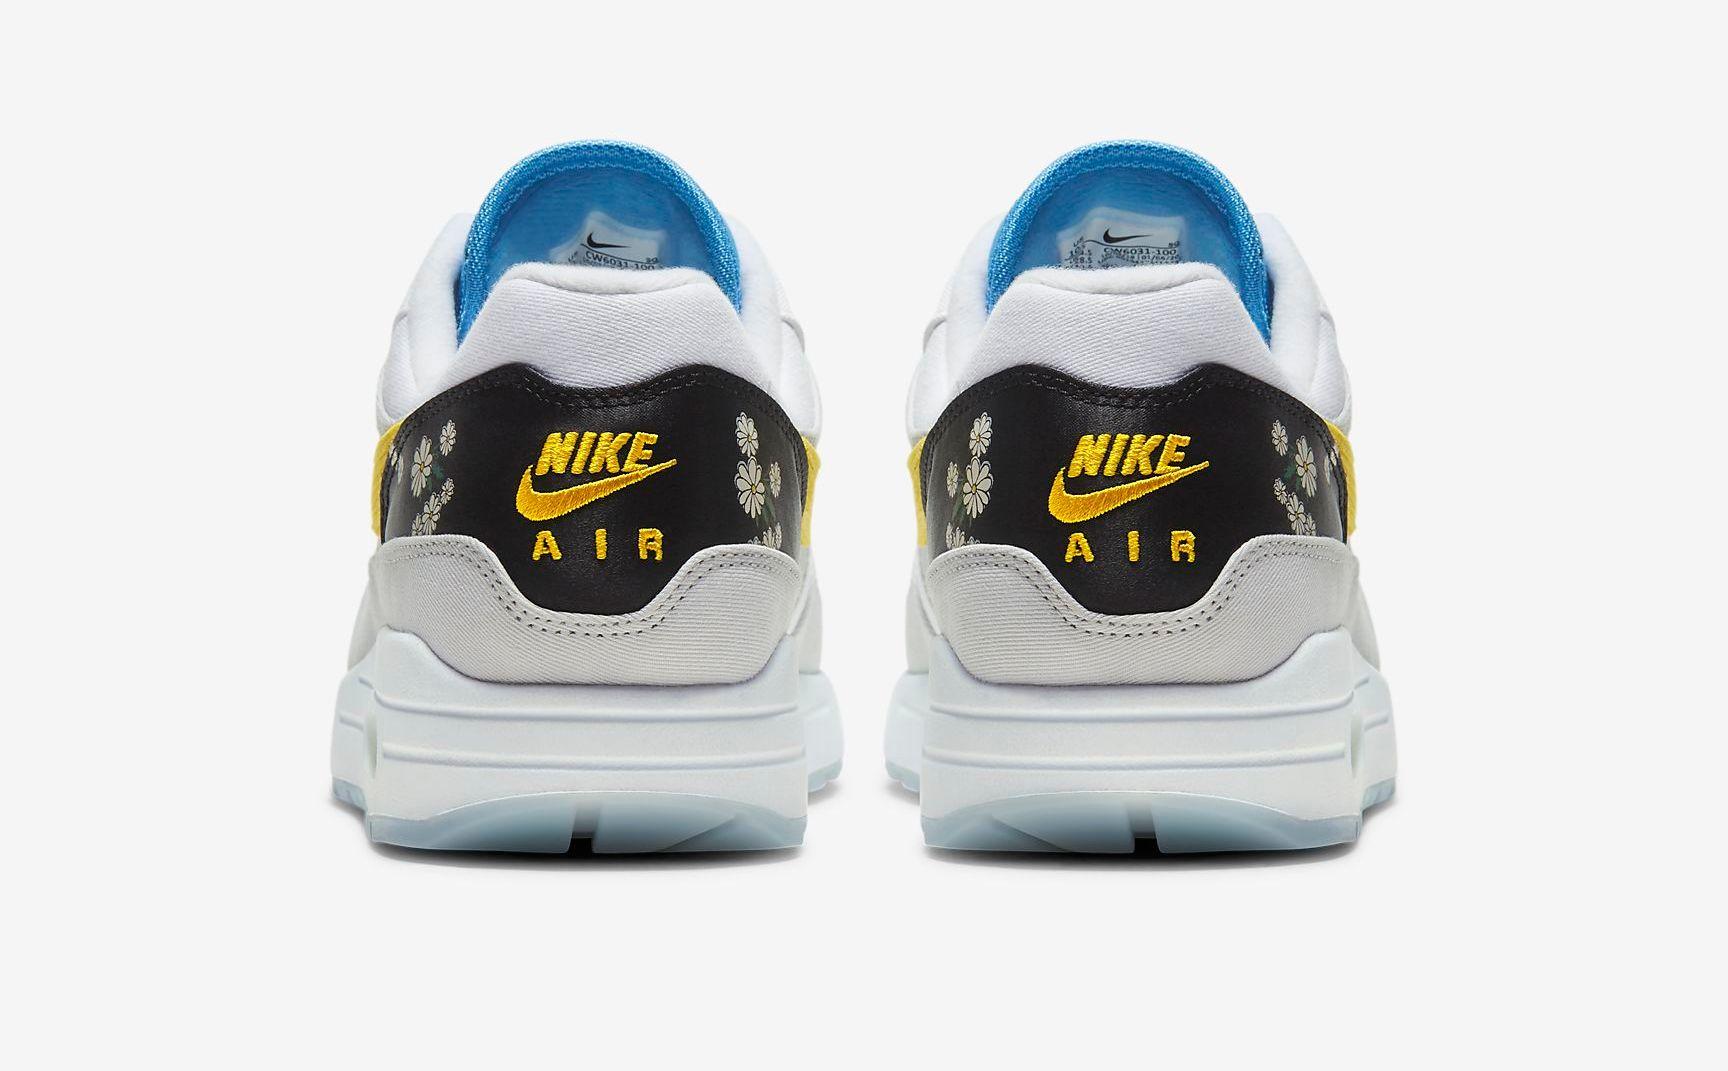 Nike Air Max 1 Daisy Heel